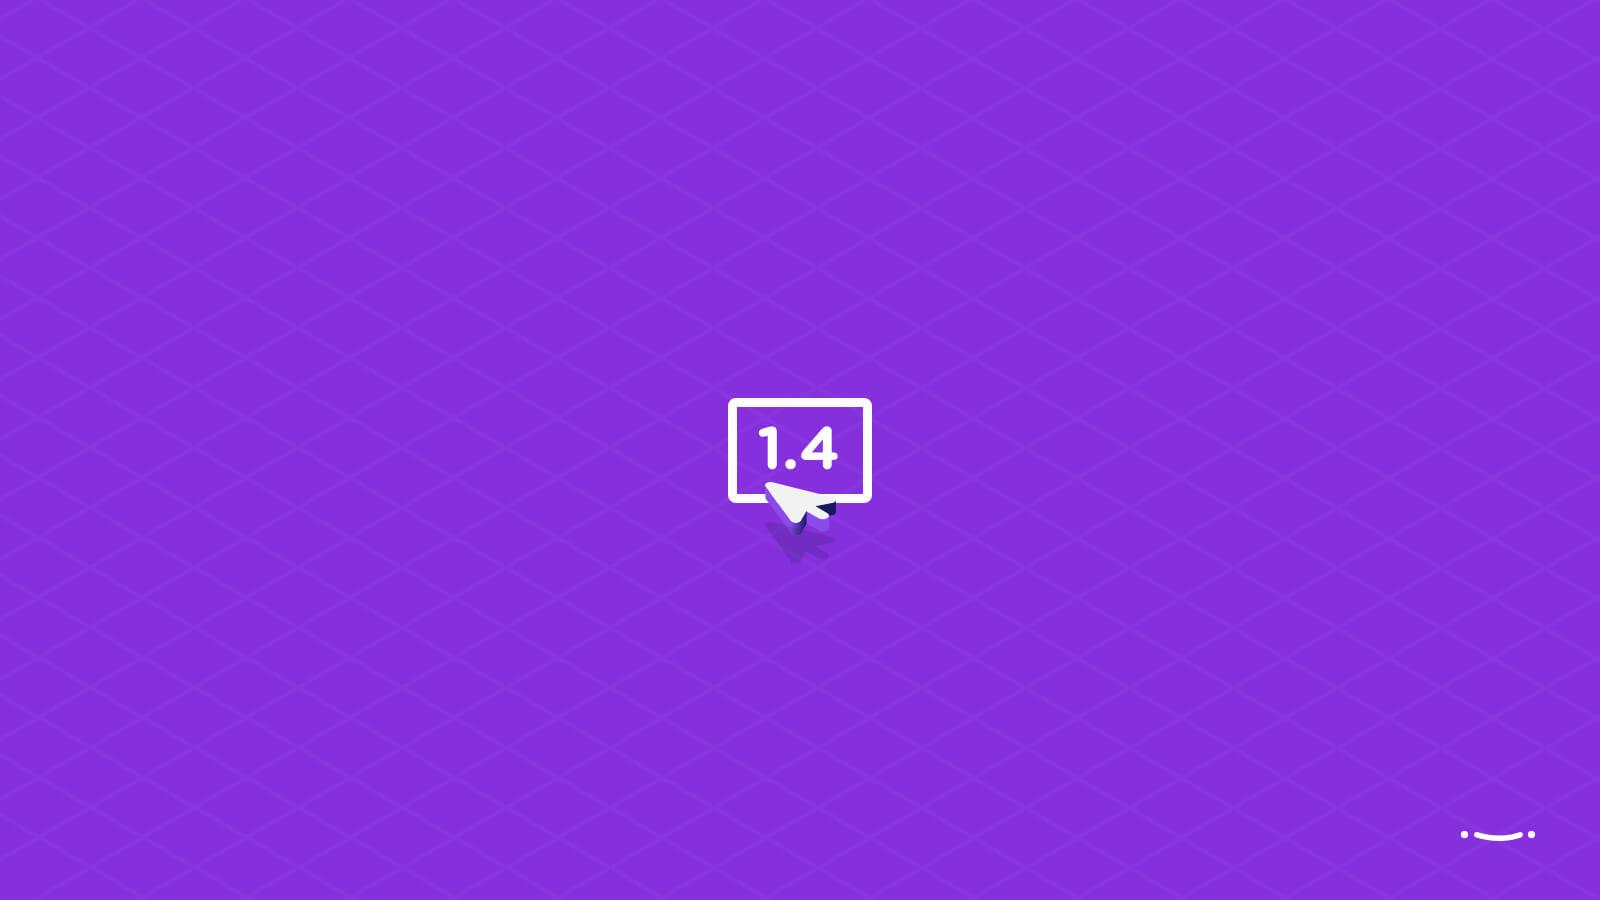 Sanlam Indie 1.4 - get rewarded for bringing your friends to Sanlam Indie